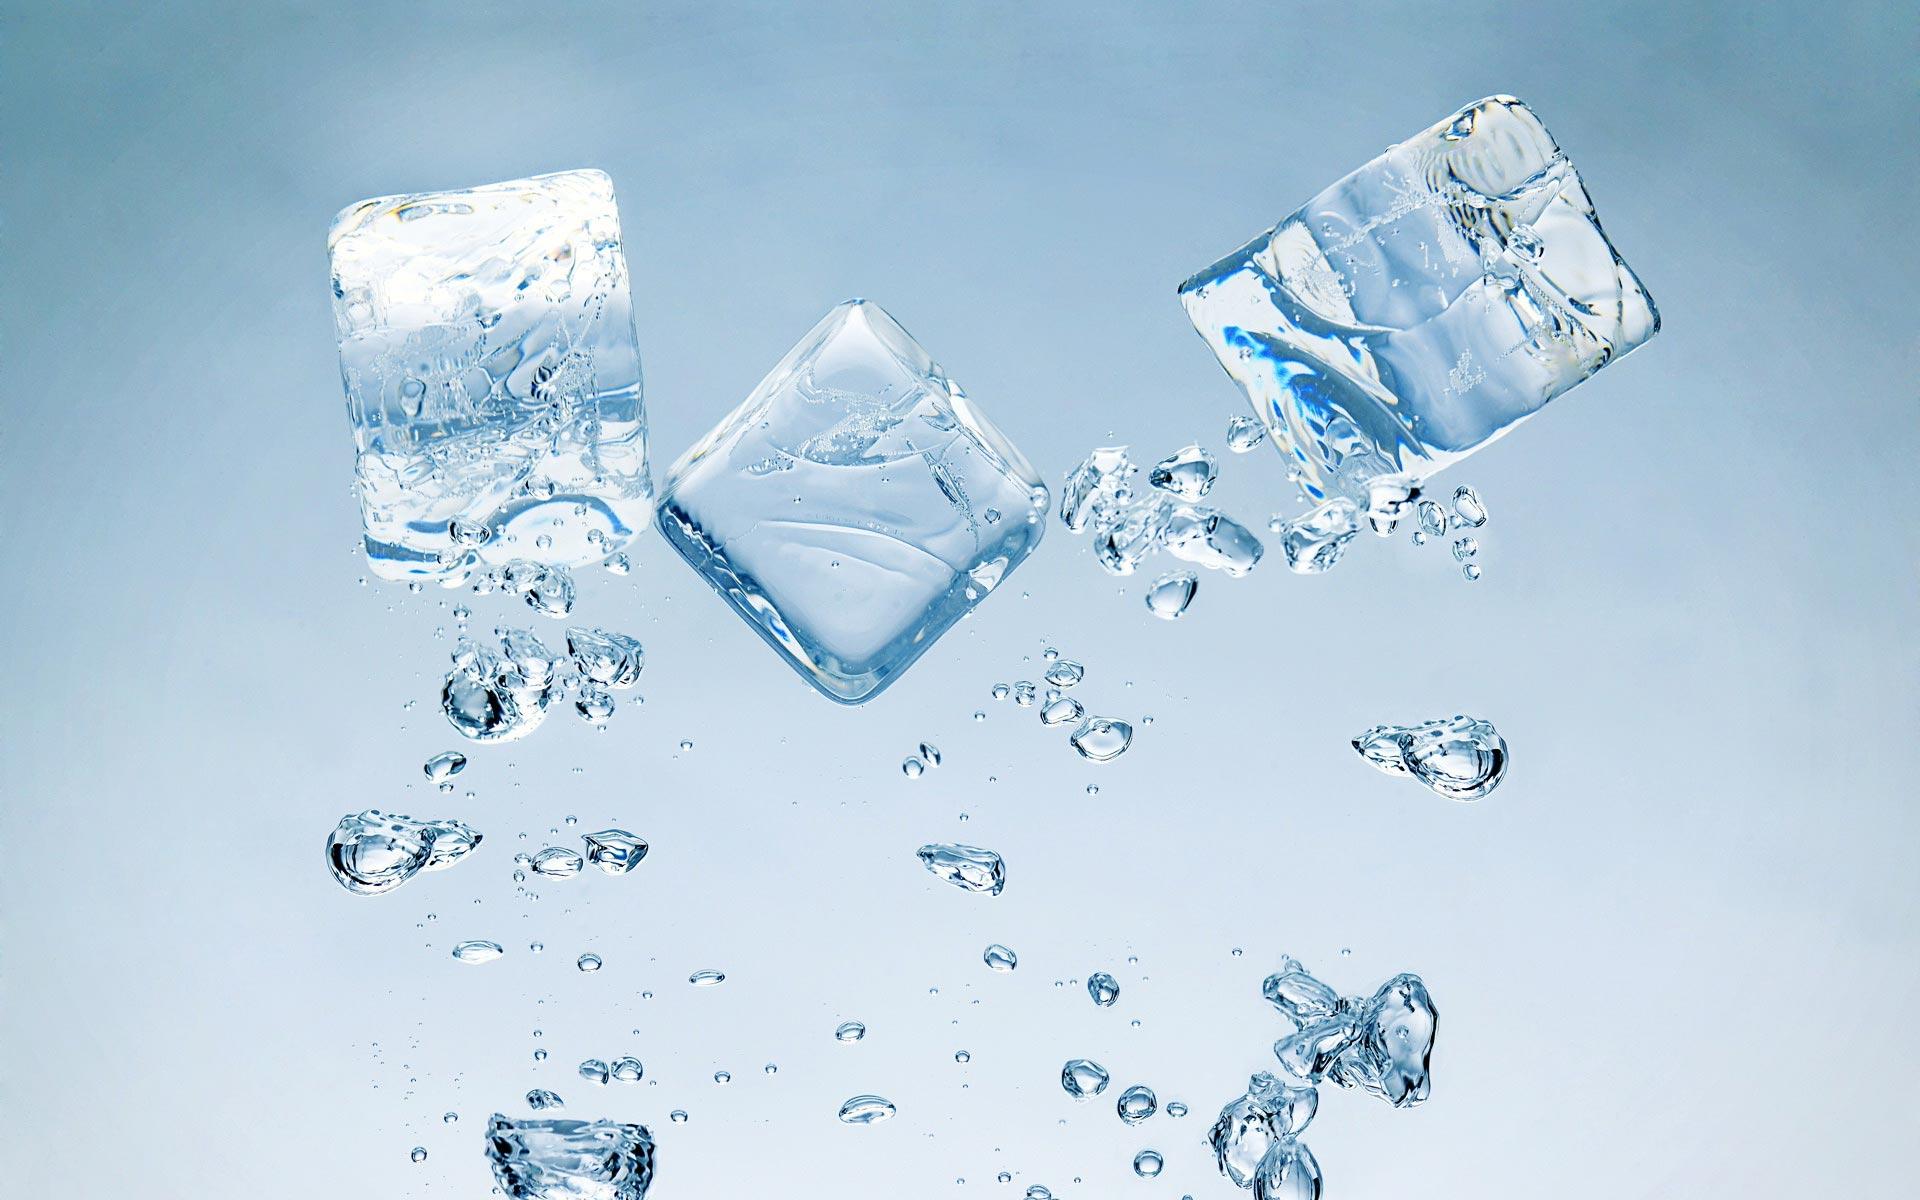 Money Falling Wallpaper Motogp Riders Step Up For The Als Ice Bucket Challenge